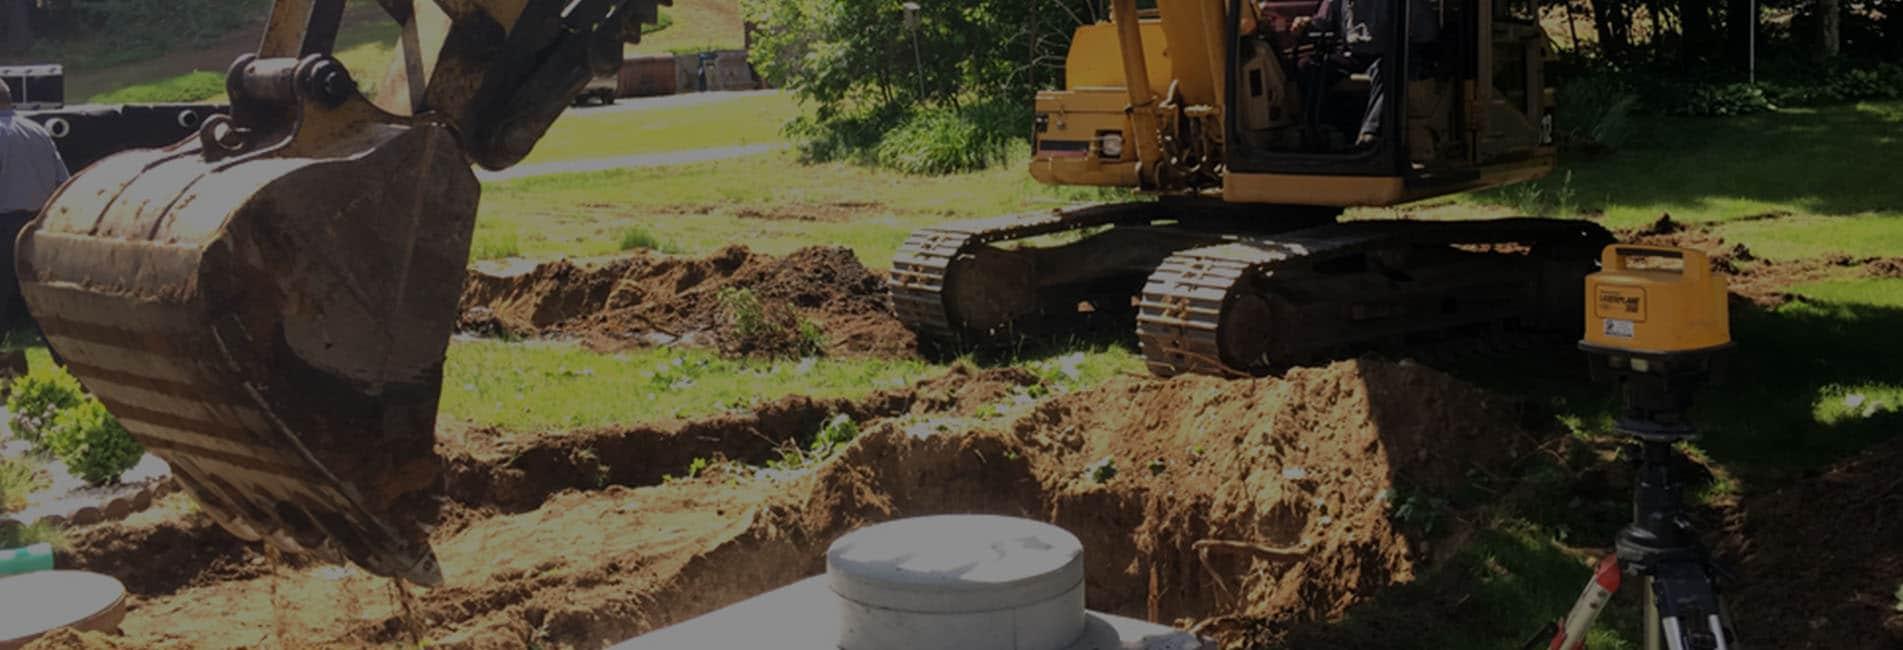 septic pumping lehigh valley pa